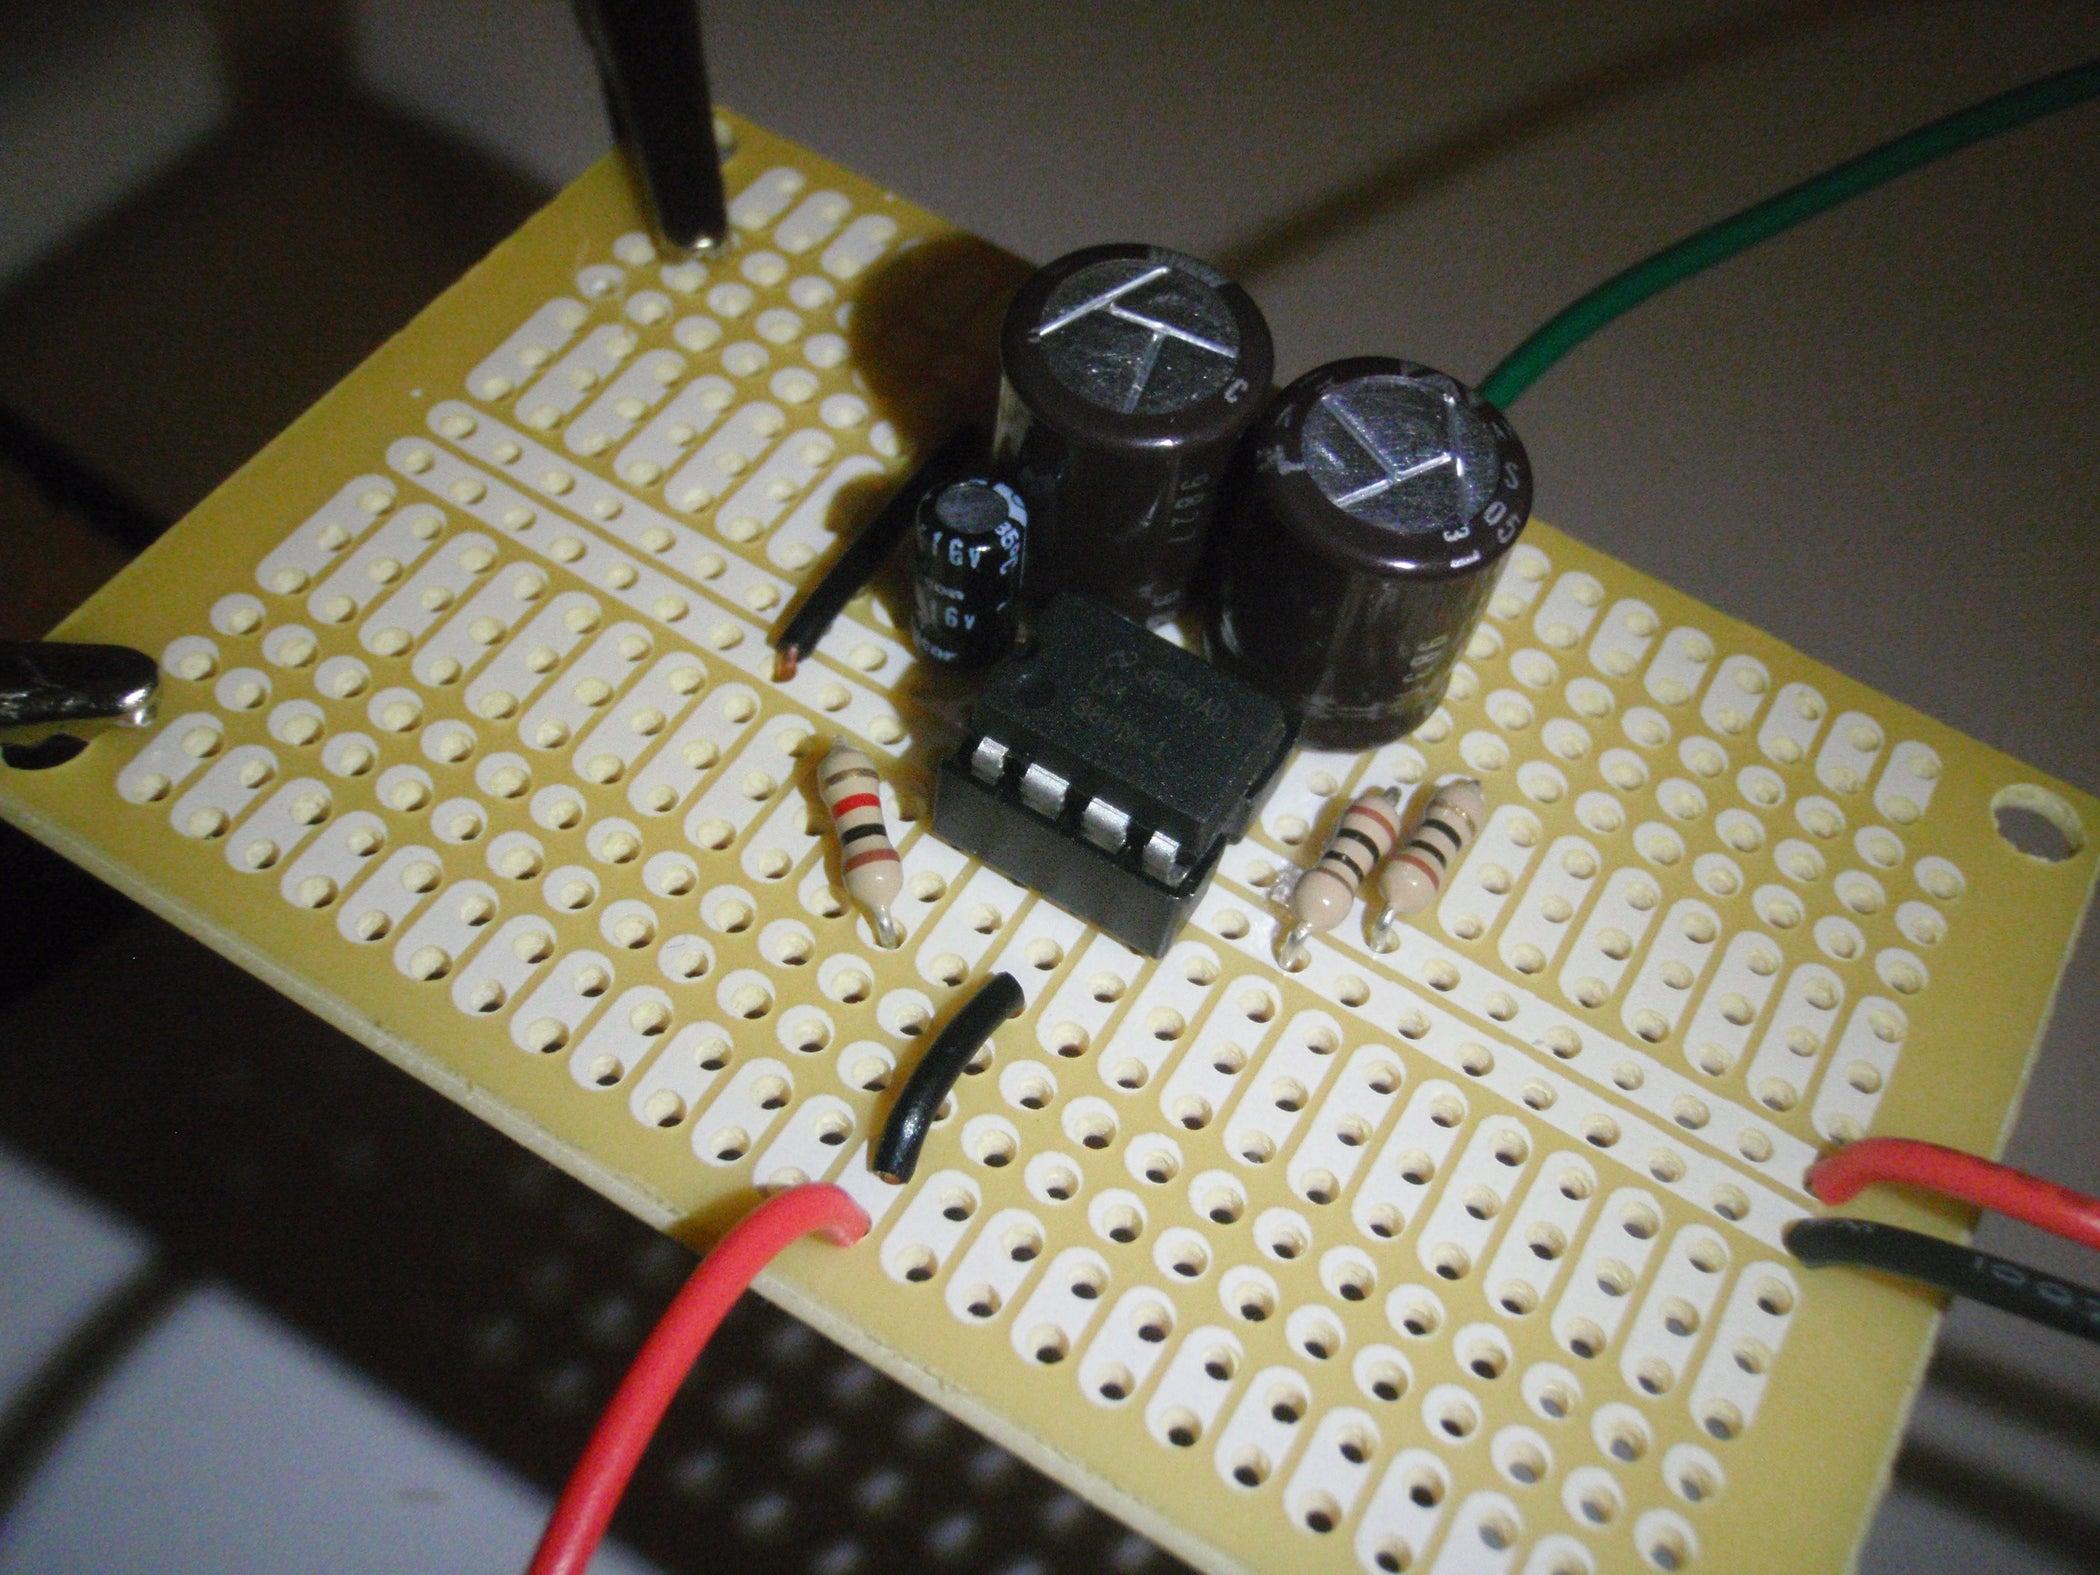 Lm386 Audio Amplifier 5 Steps 10 Watt Circuit Diagram